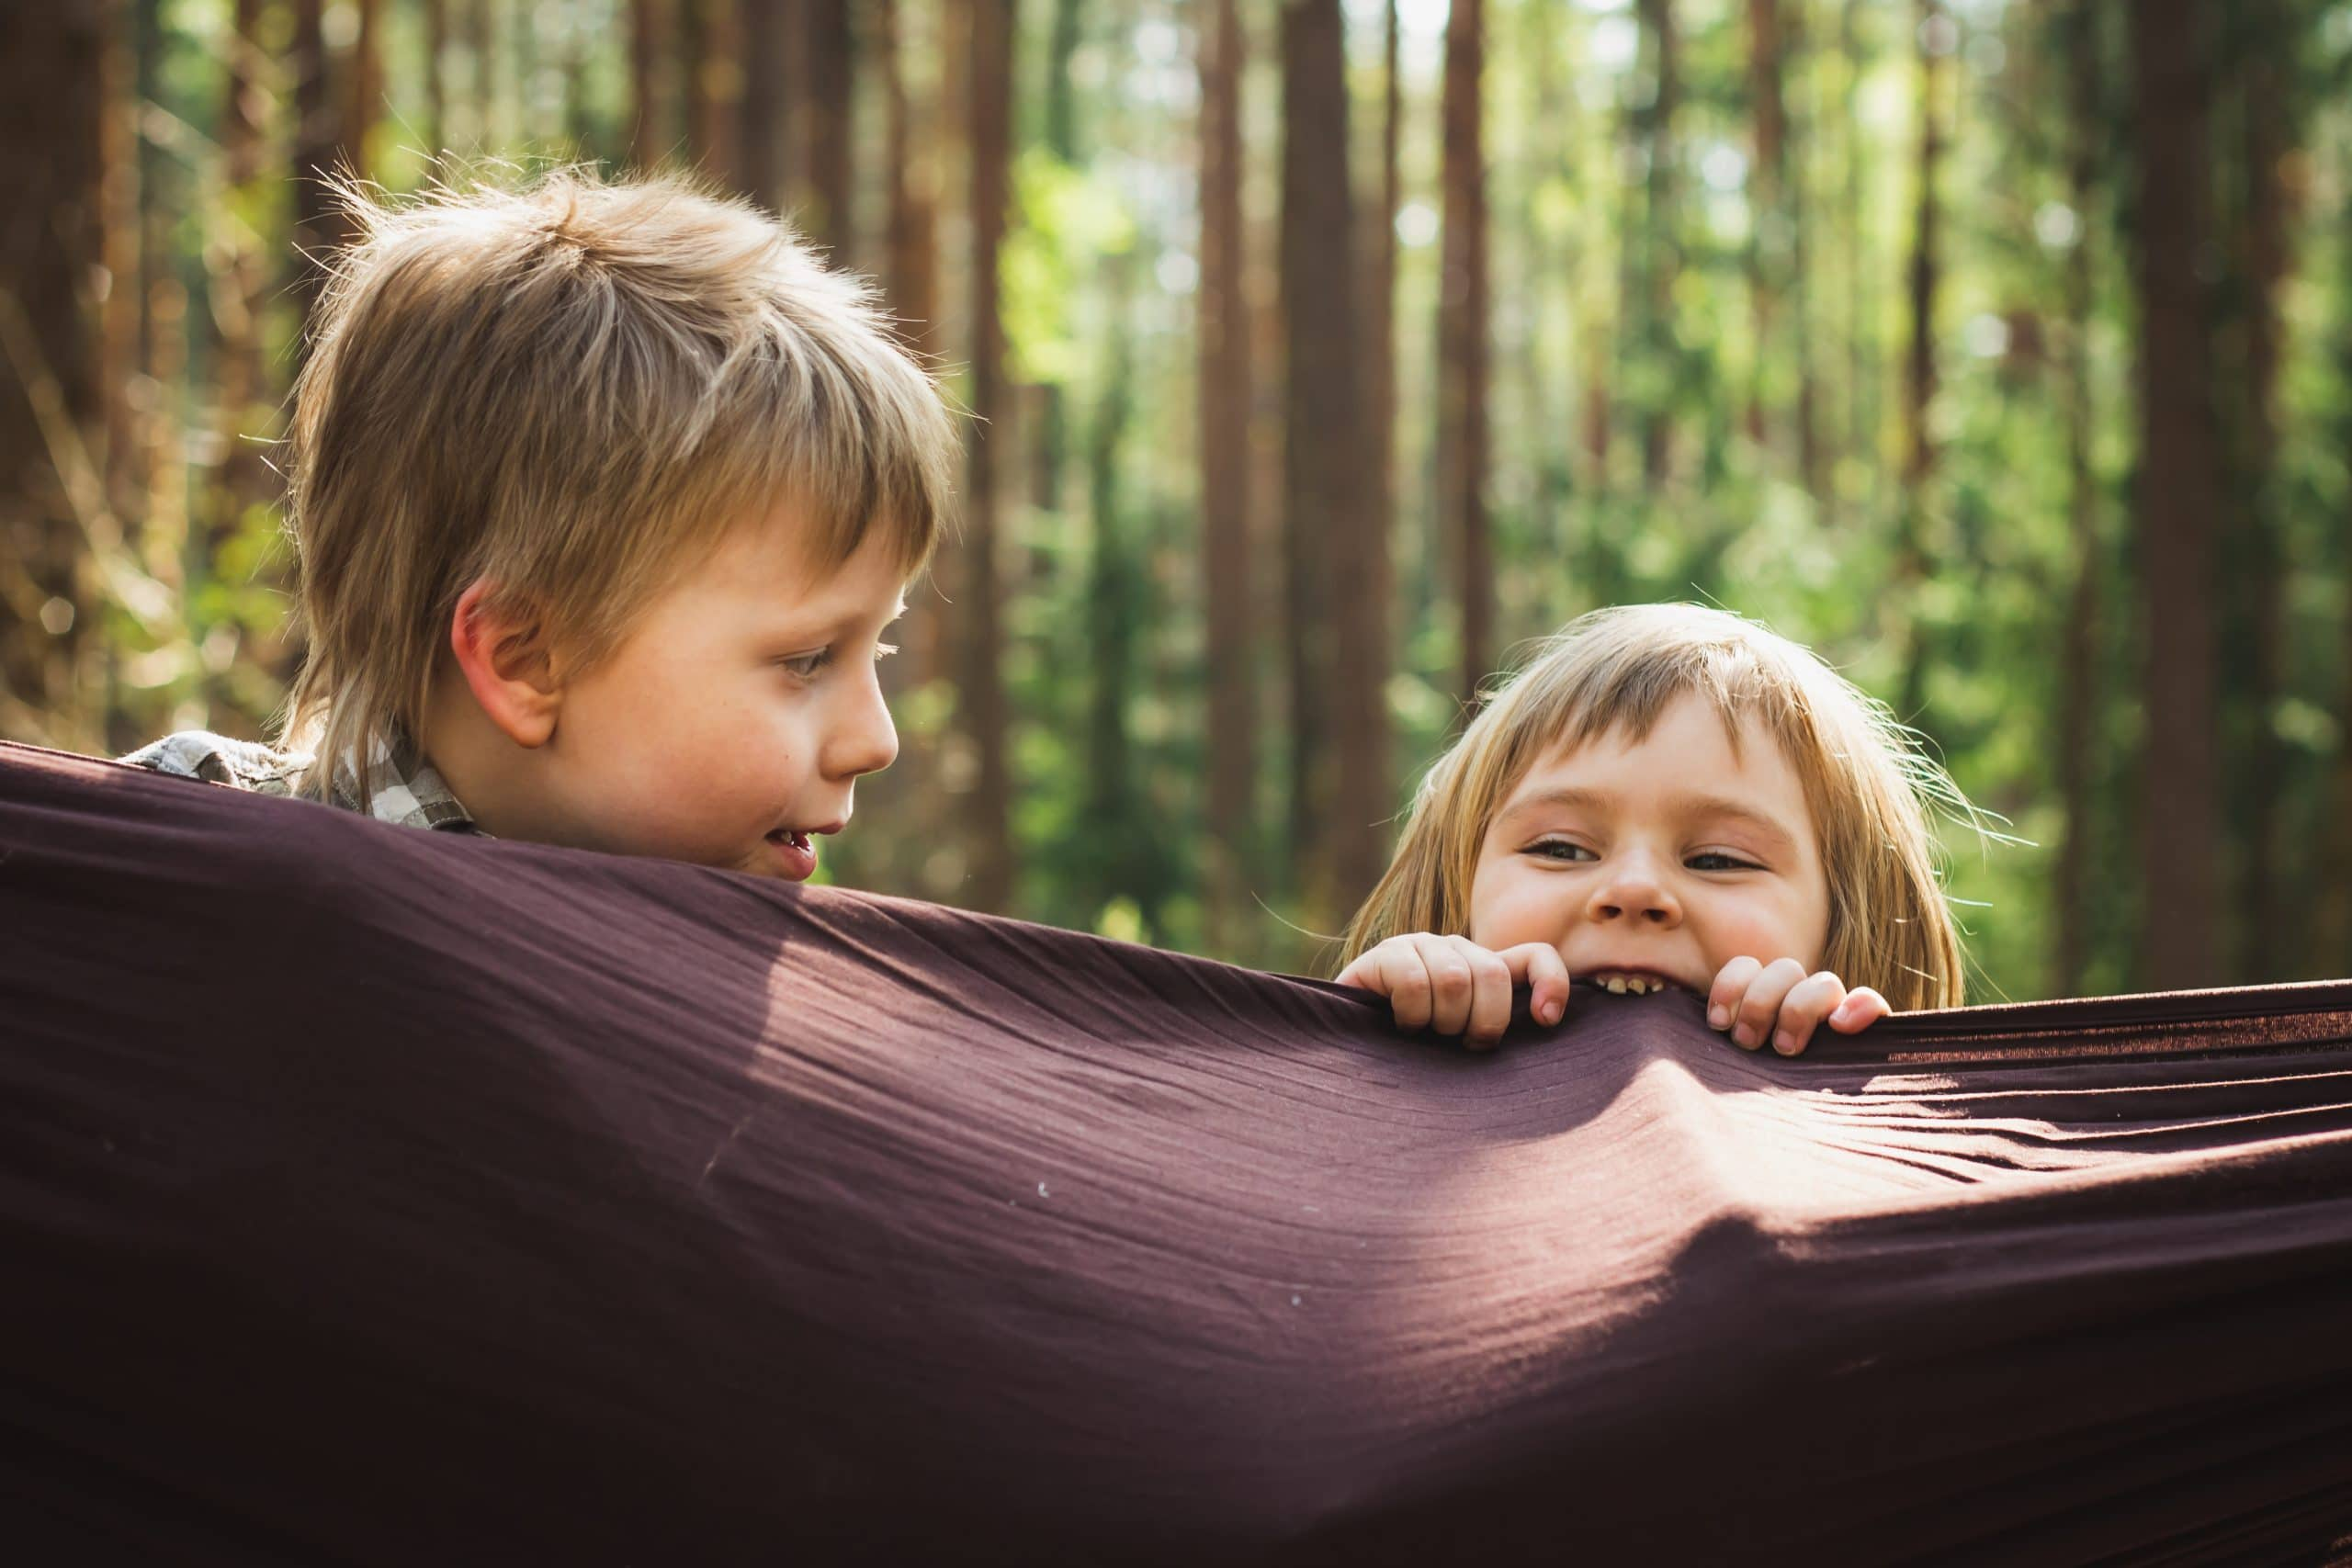 Romper 6 kid safe repellents